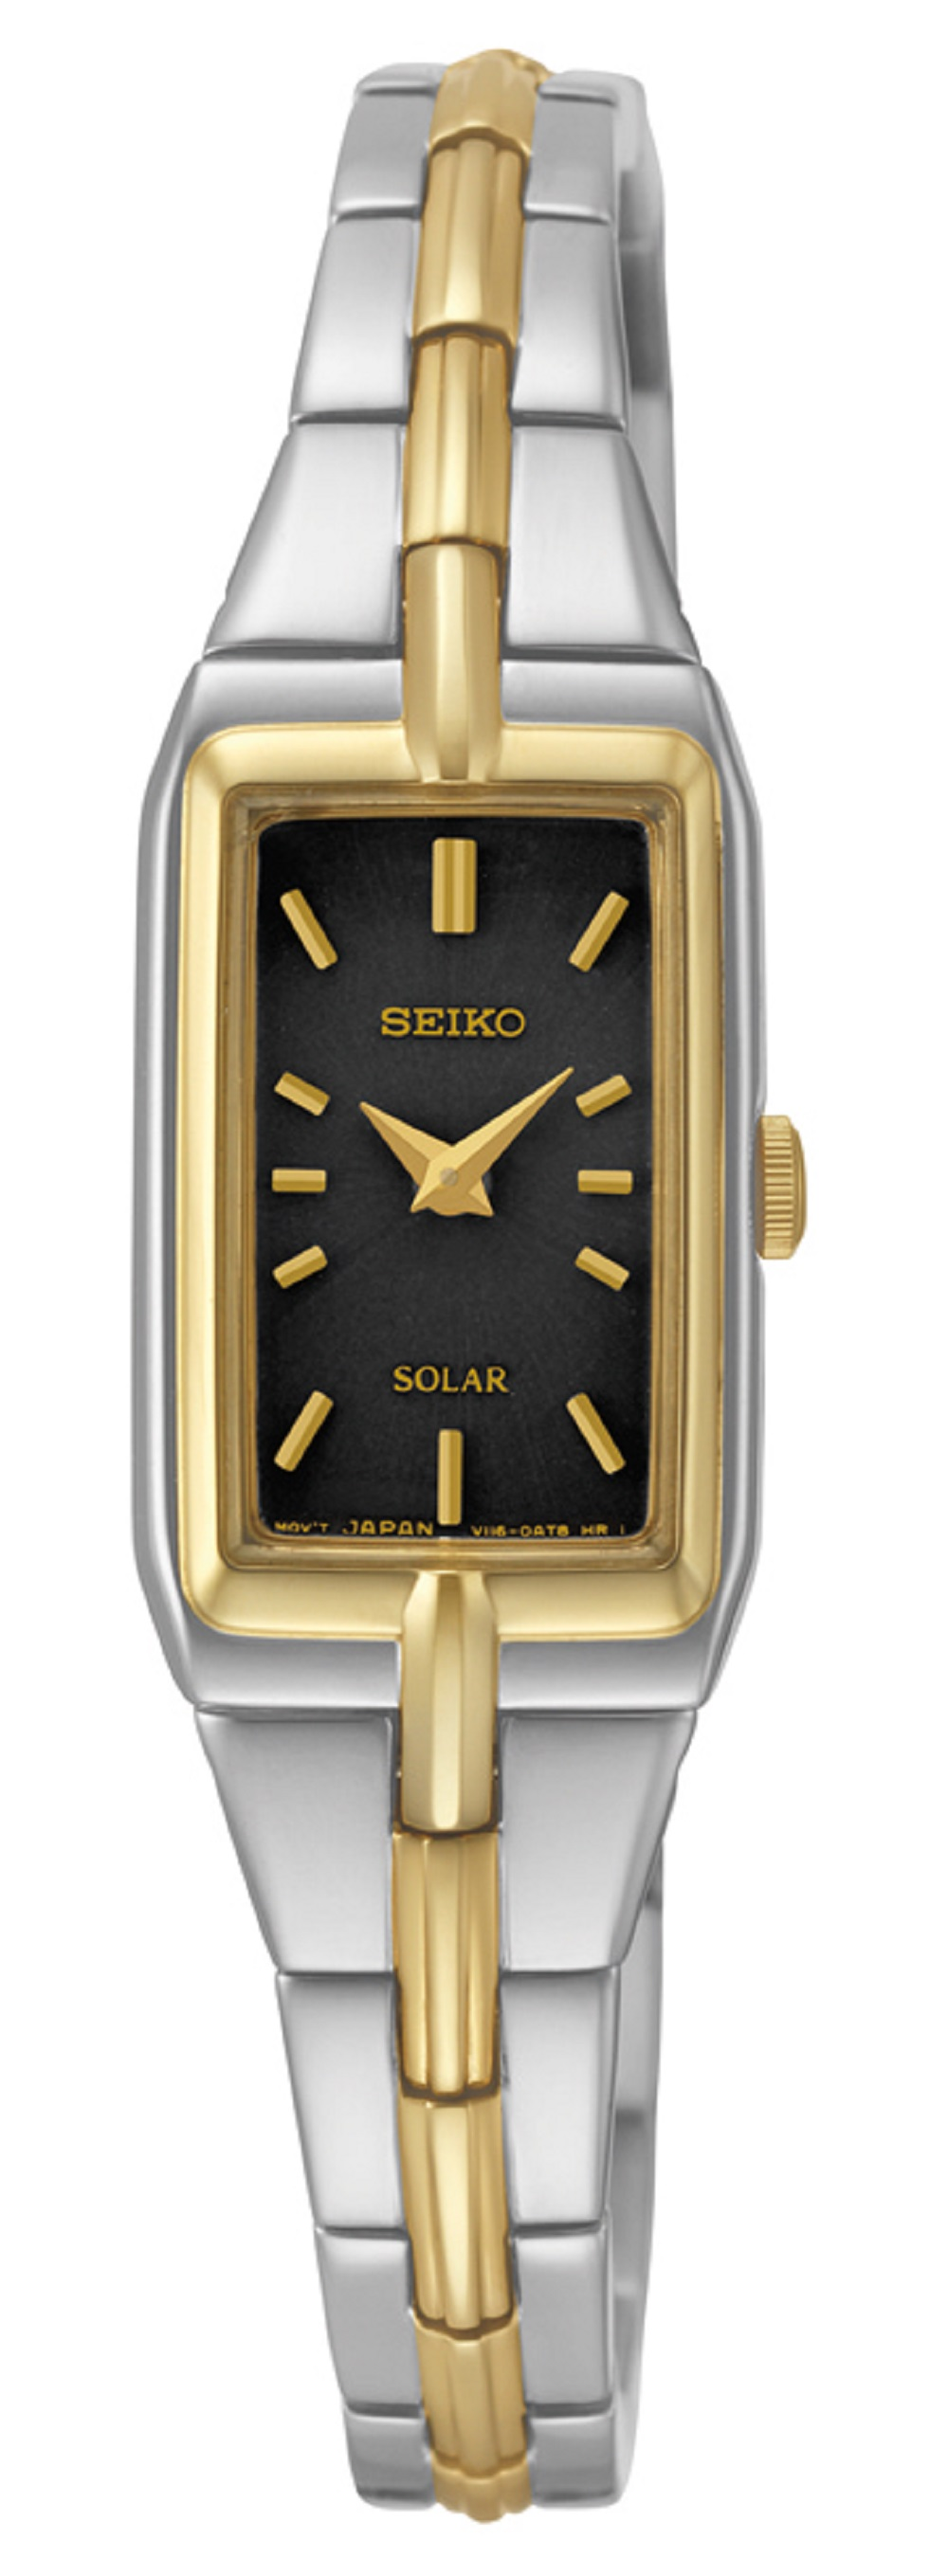 solar watch for women - Black dial & Gold plated bracelet